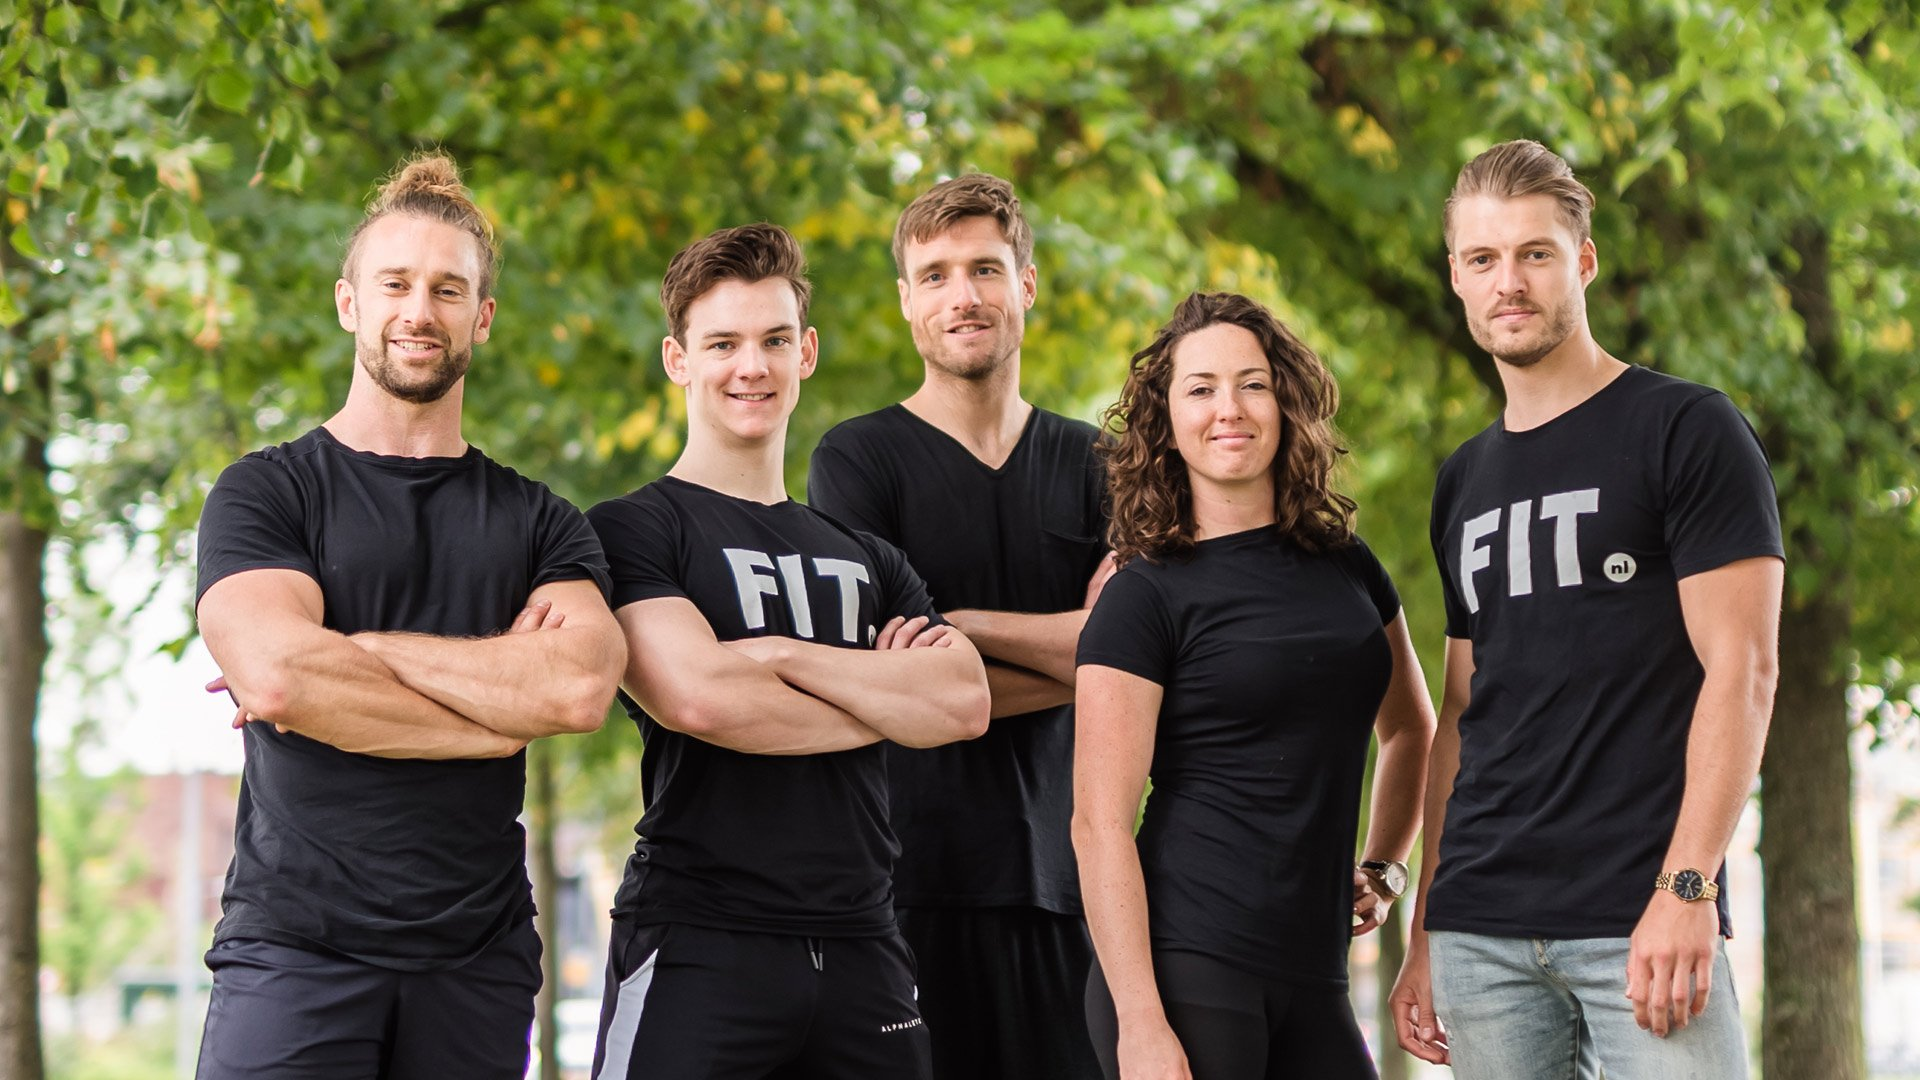 team-fitnl